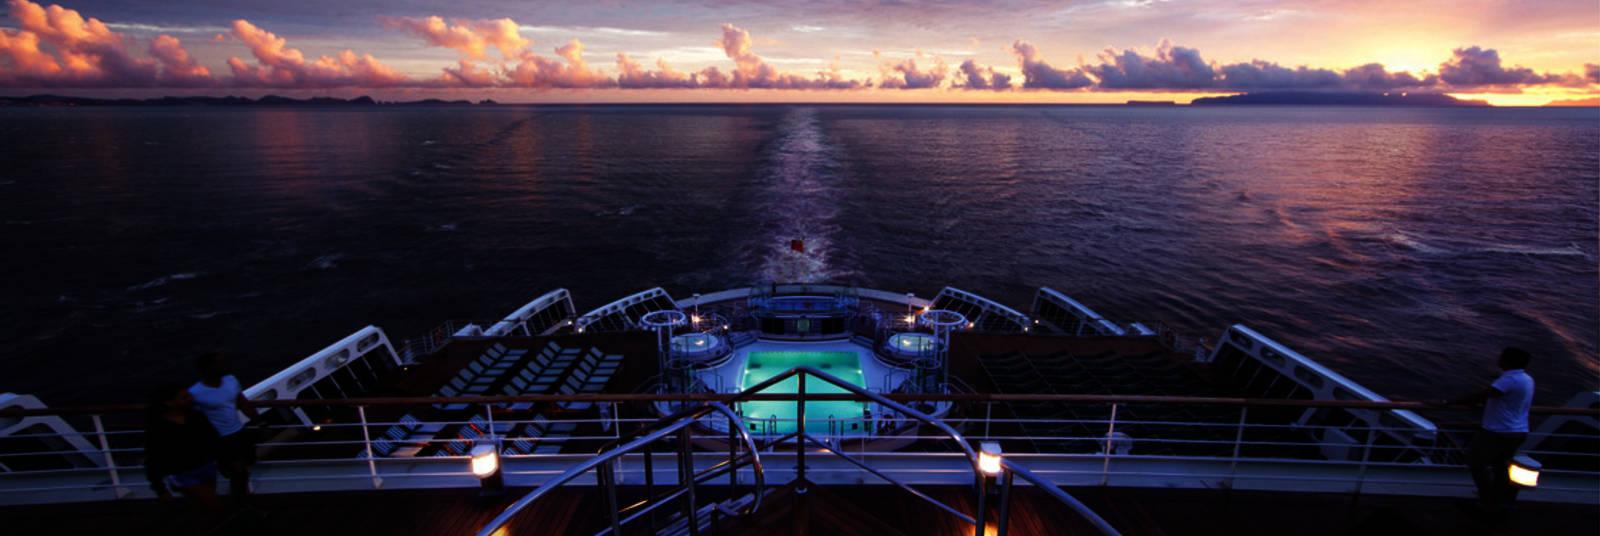 Homepage_large_queen_elizabeth_deck_at_sea